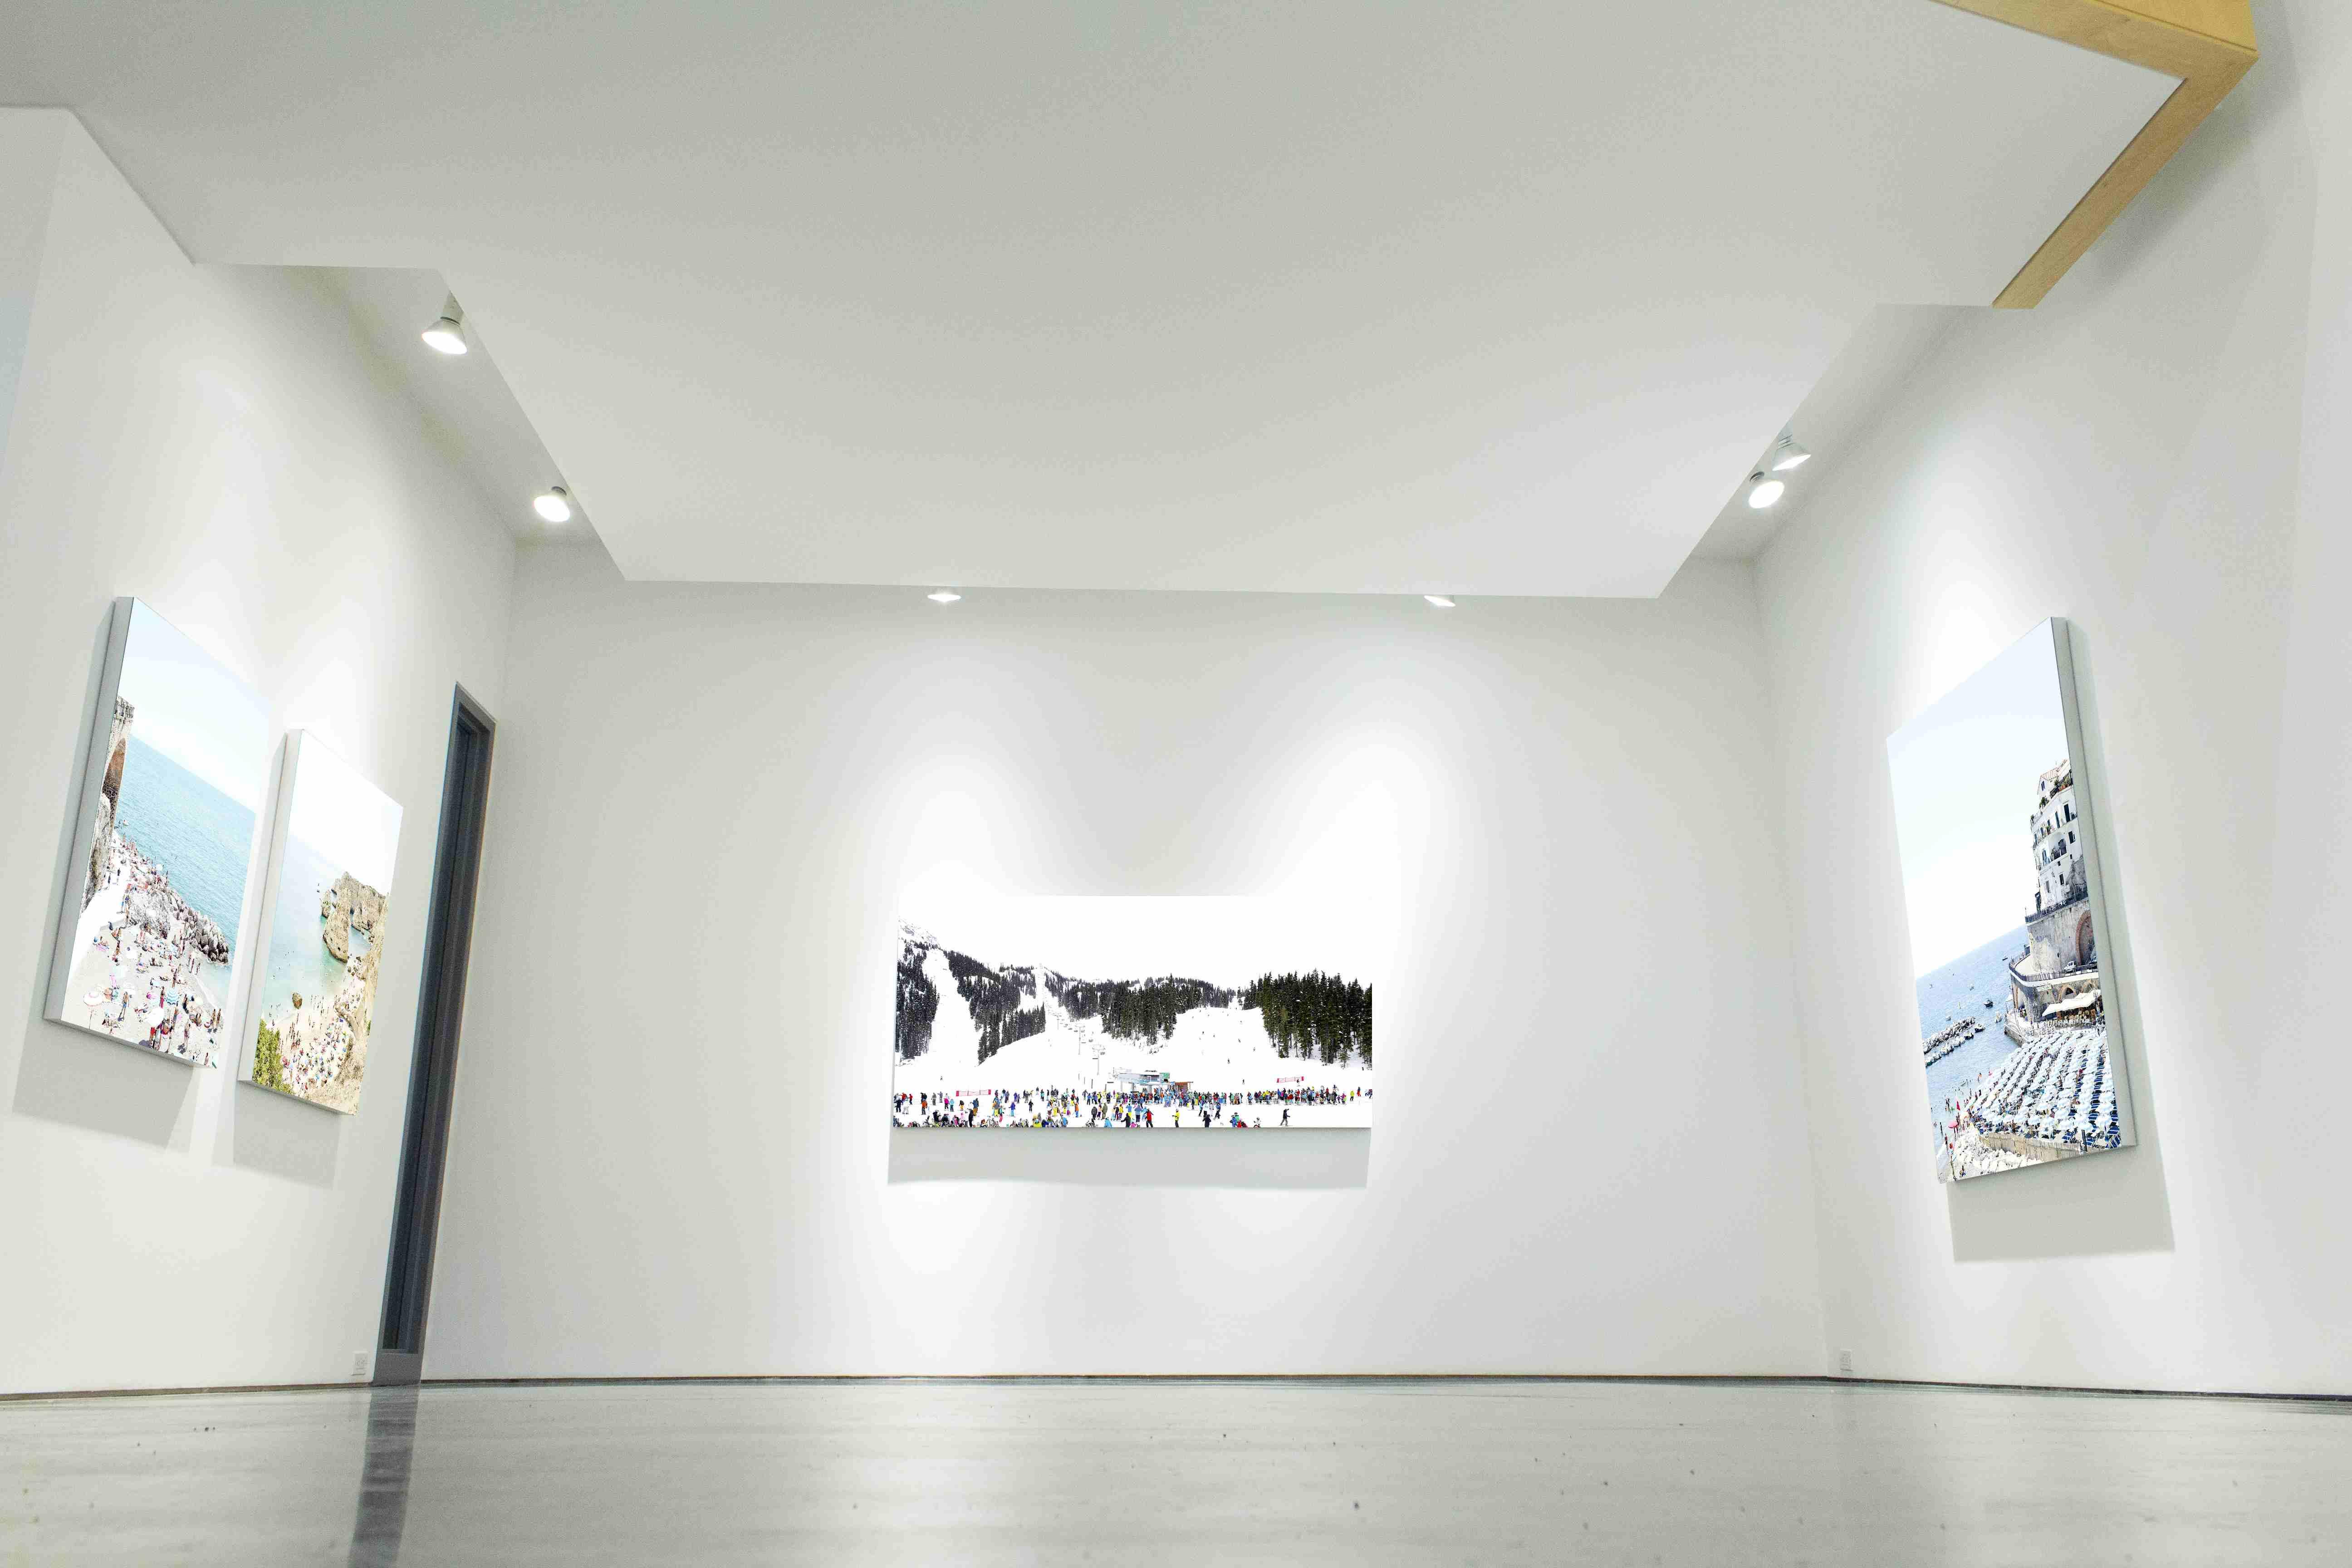 Installation of Joshua Jensen-Nagle's